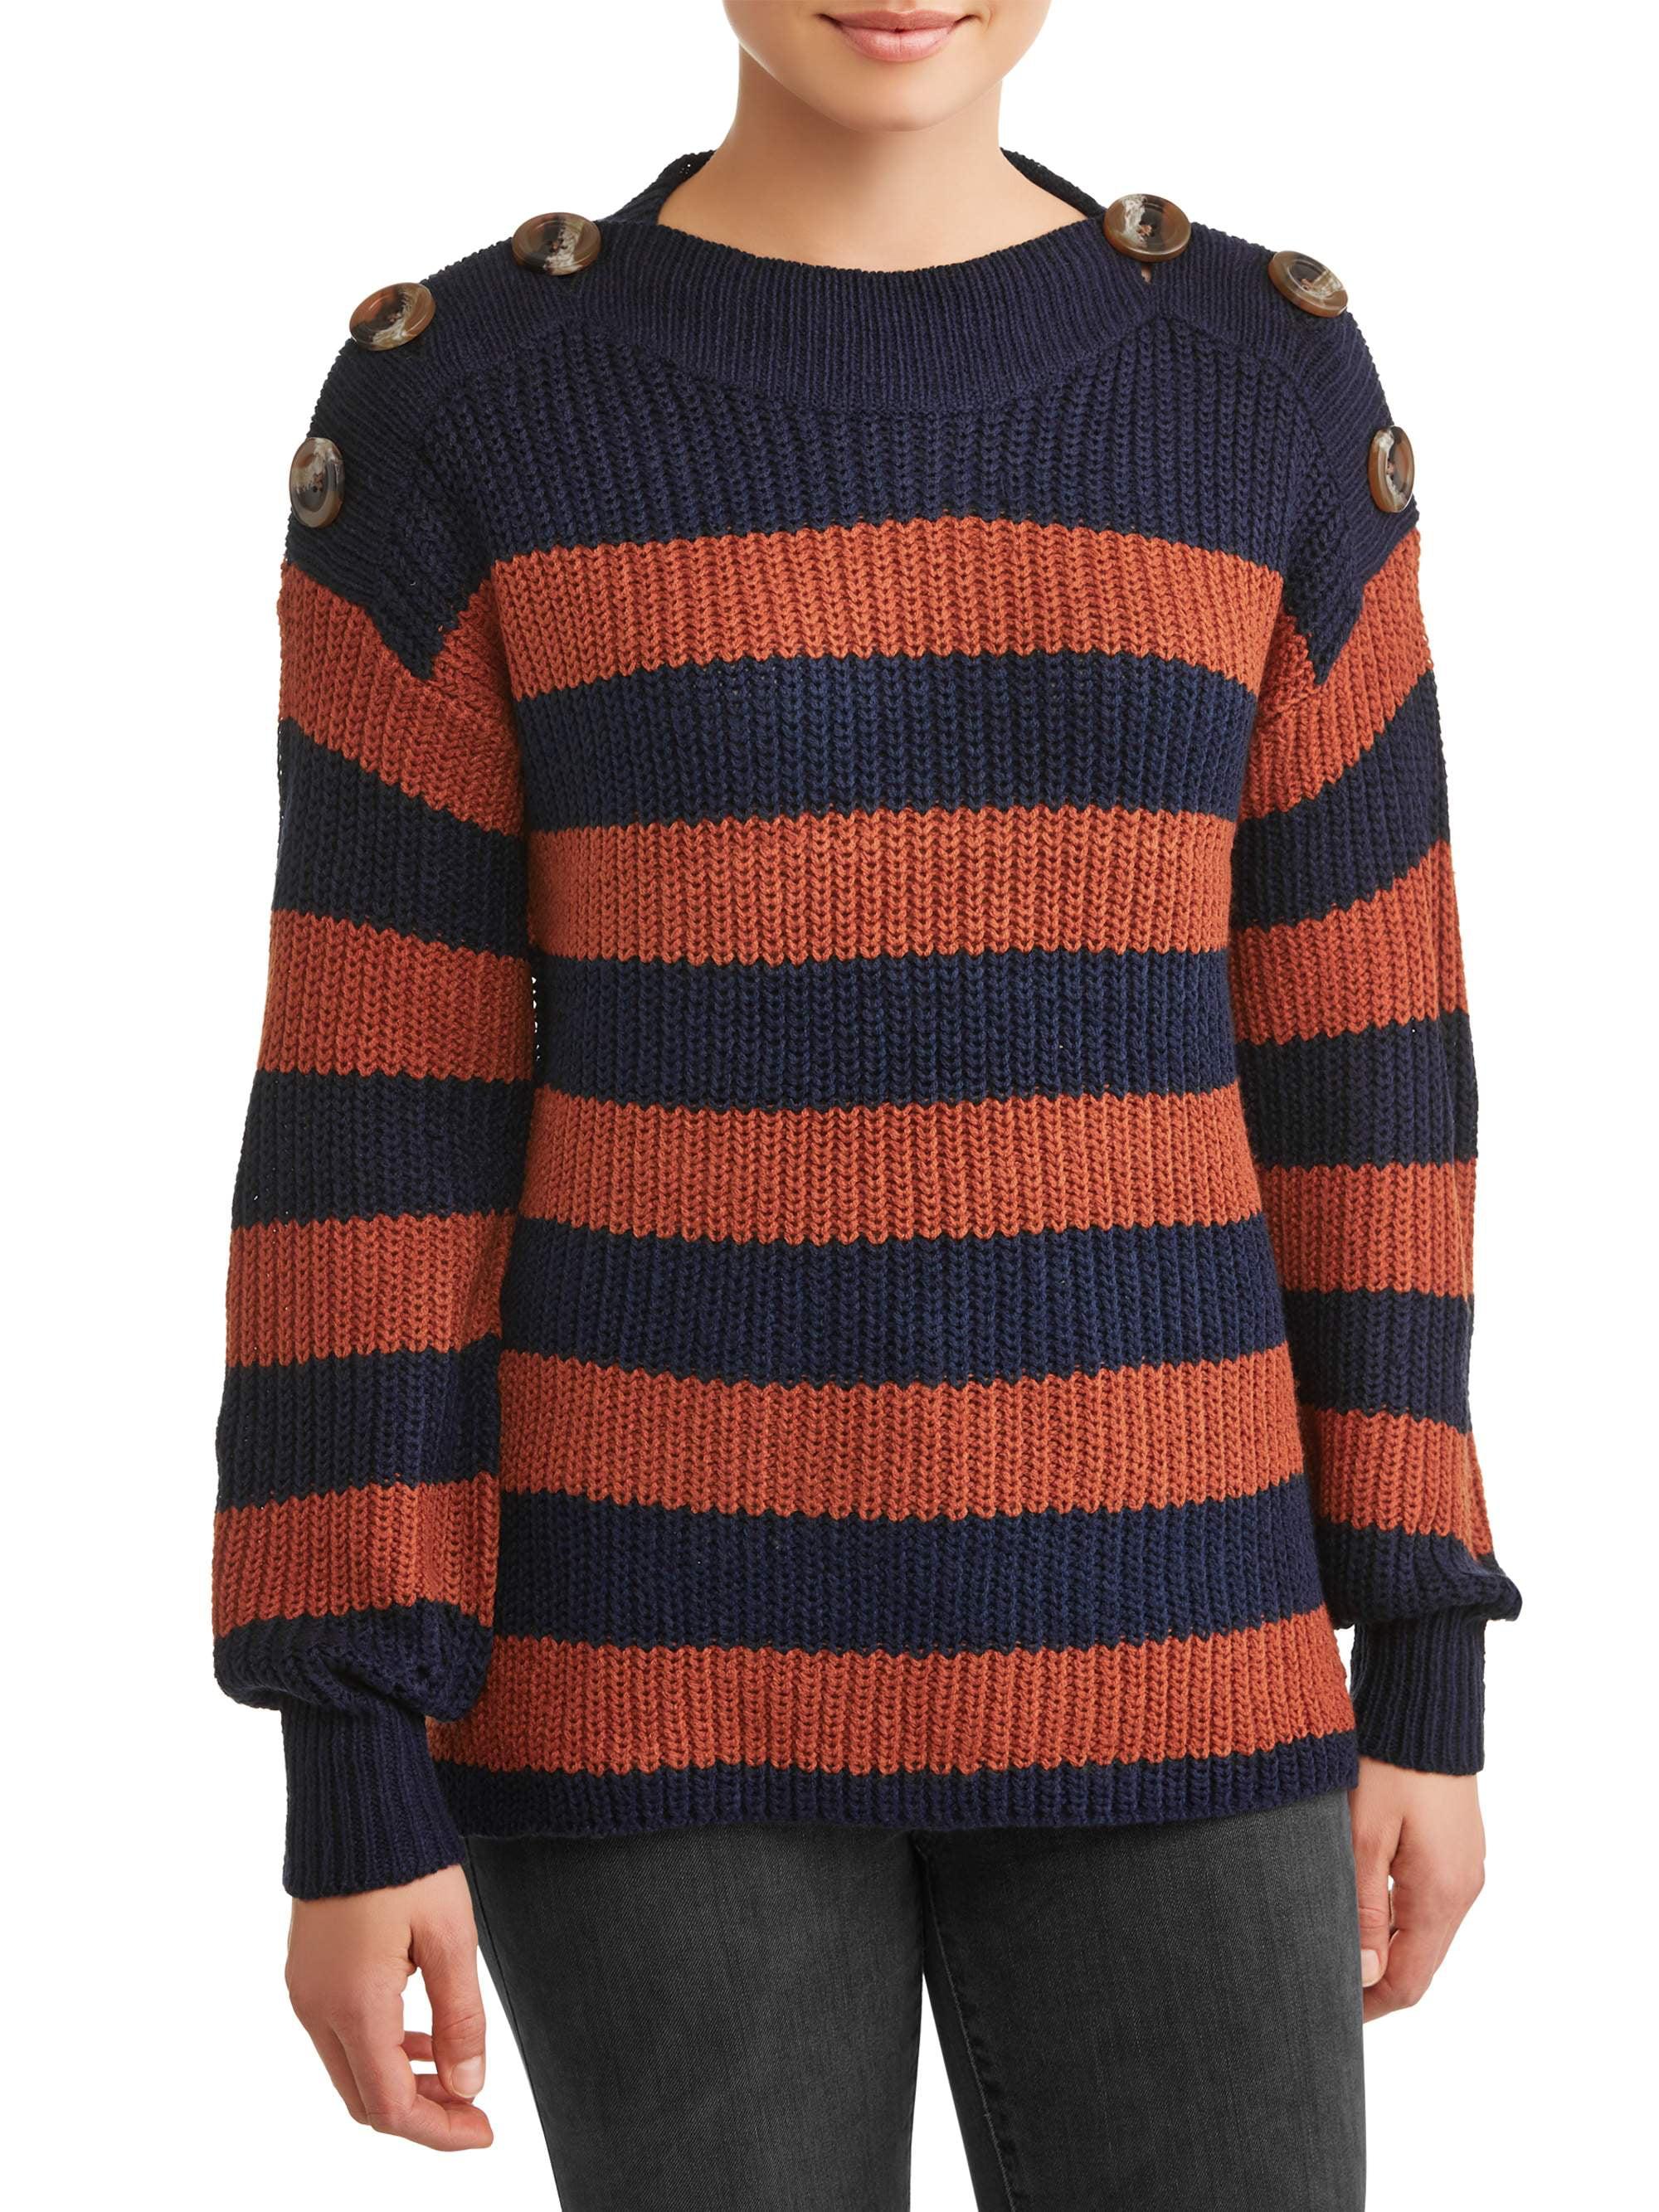 Women's Rib Cuff Sweater